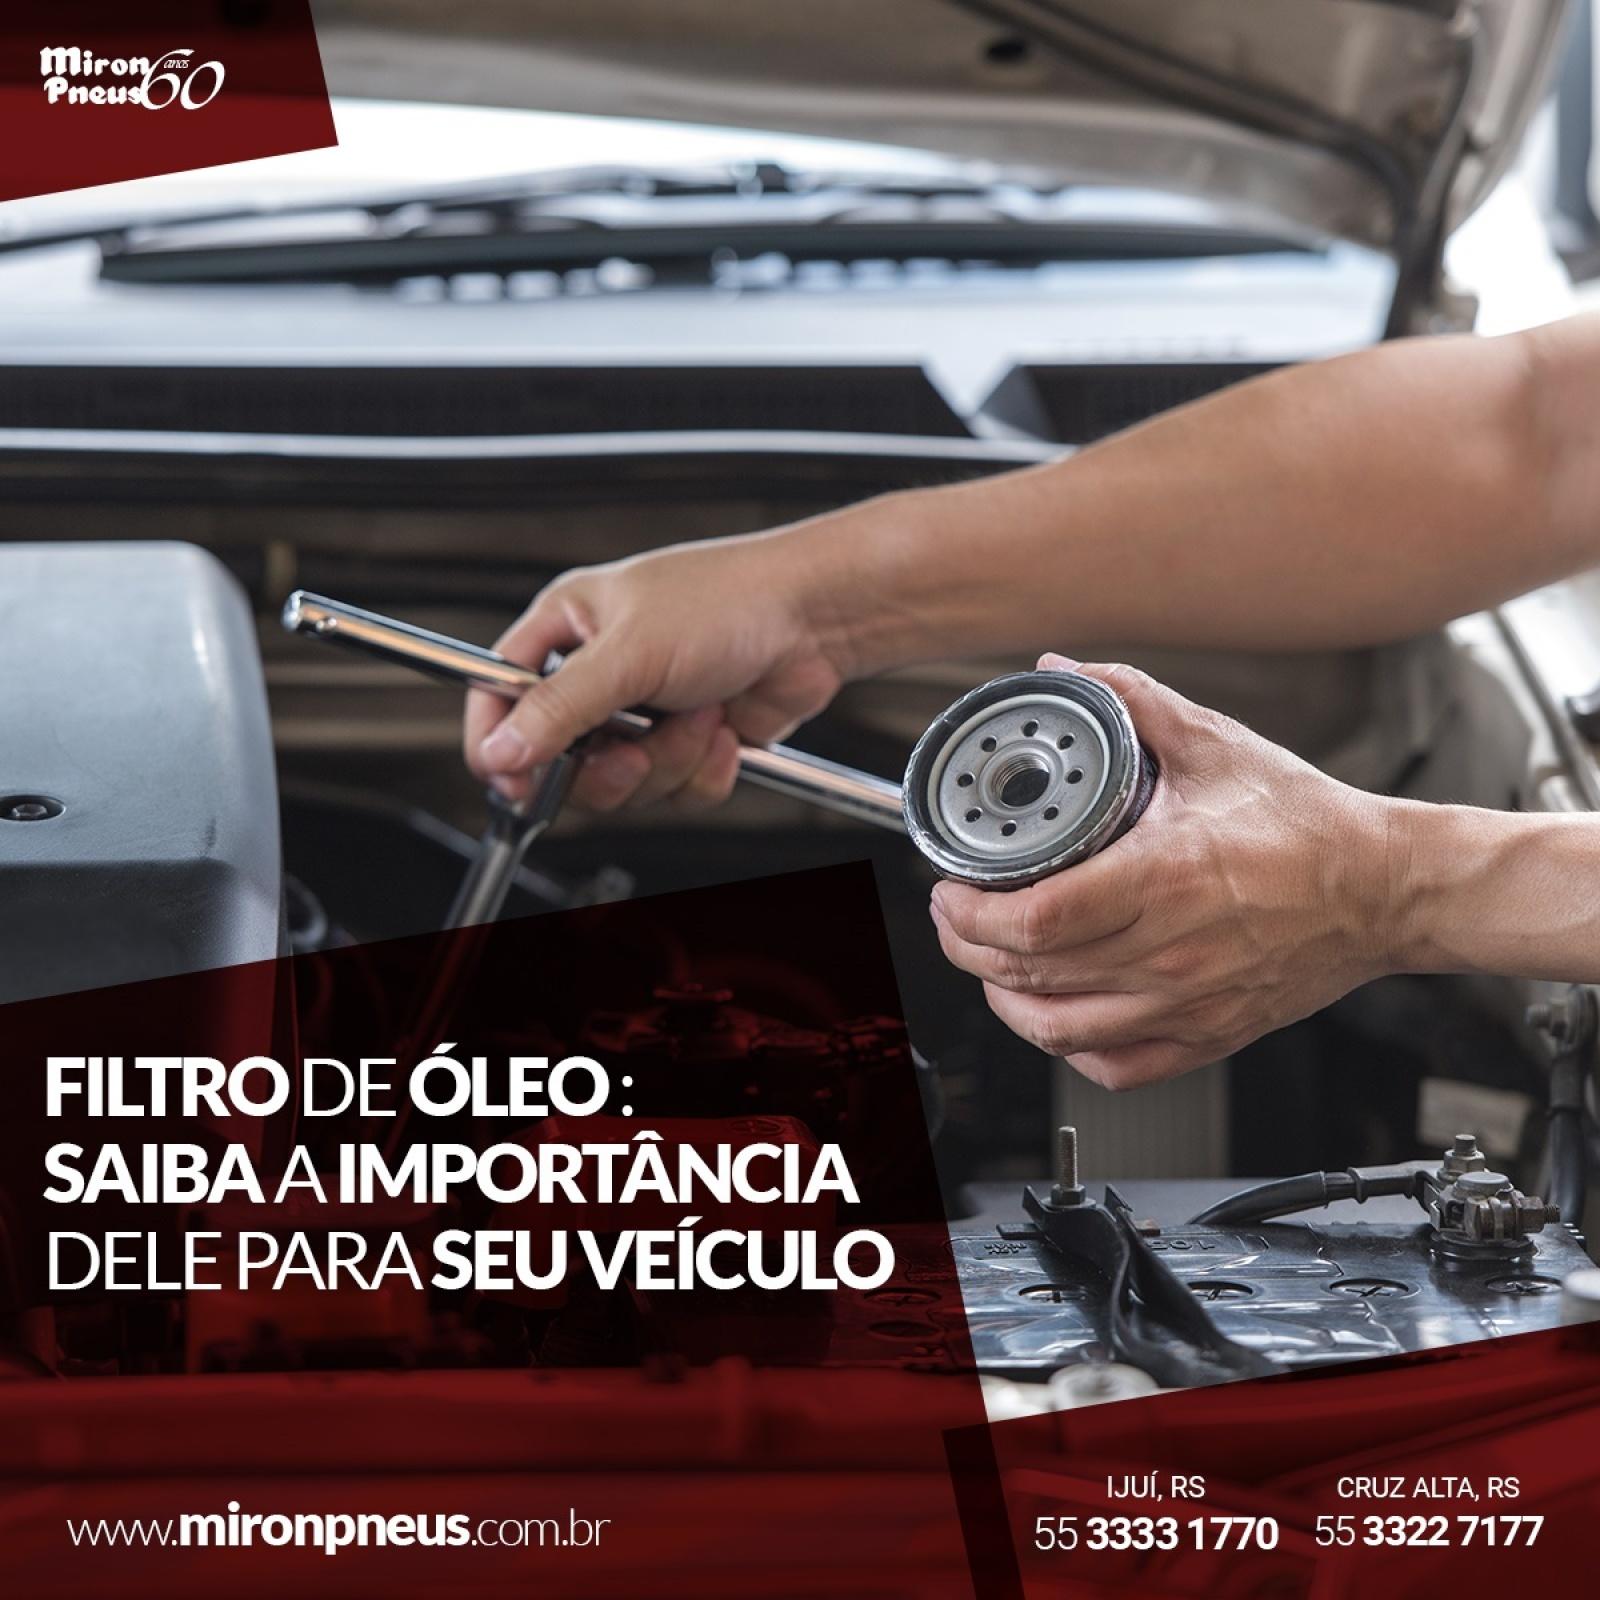 Filtro de óleo – saiba a importância dele para seu veículo